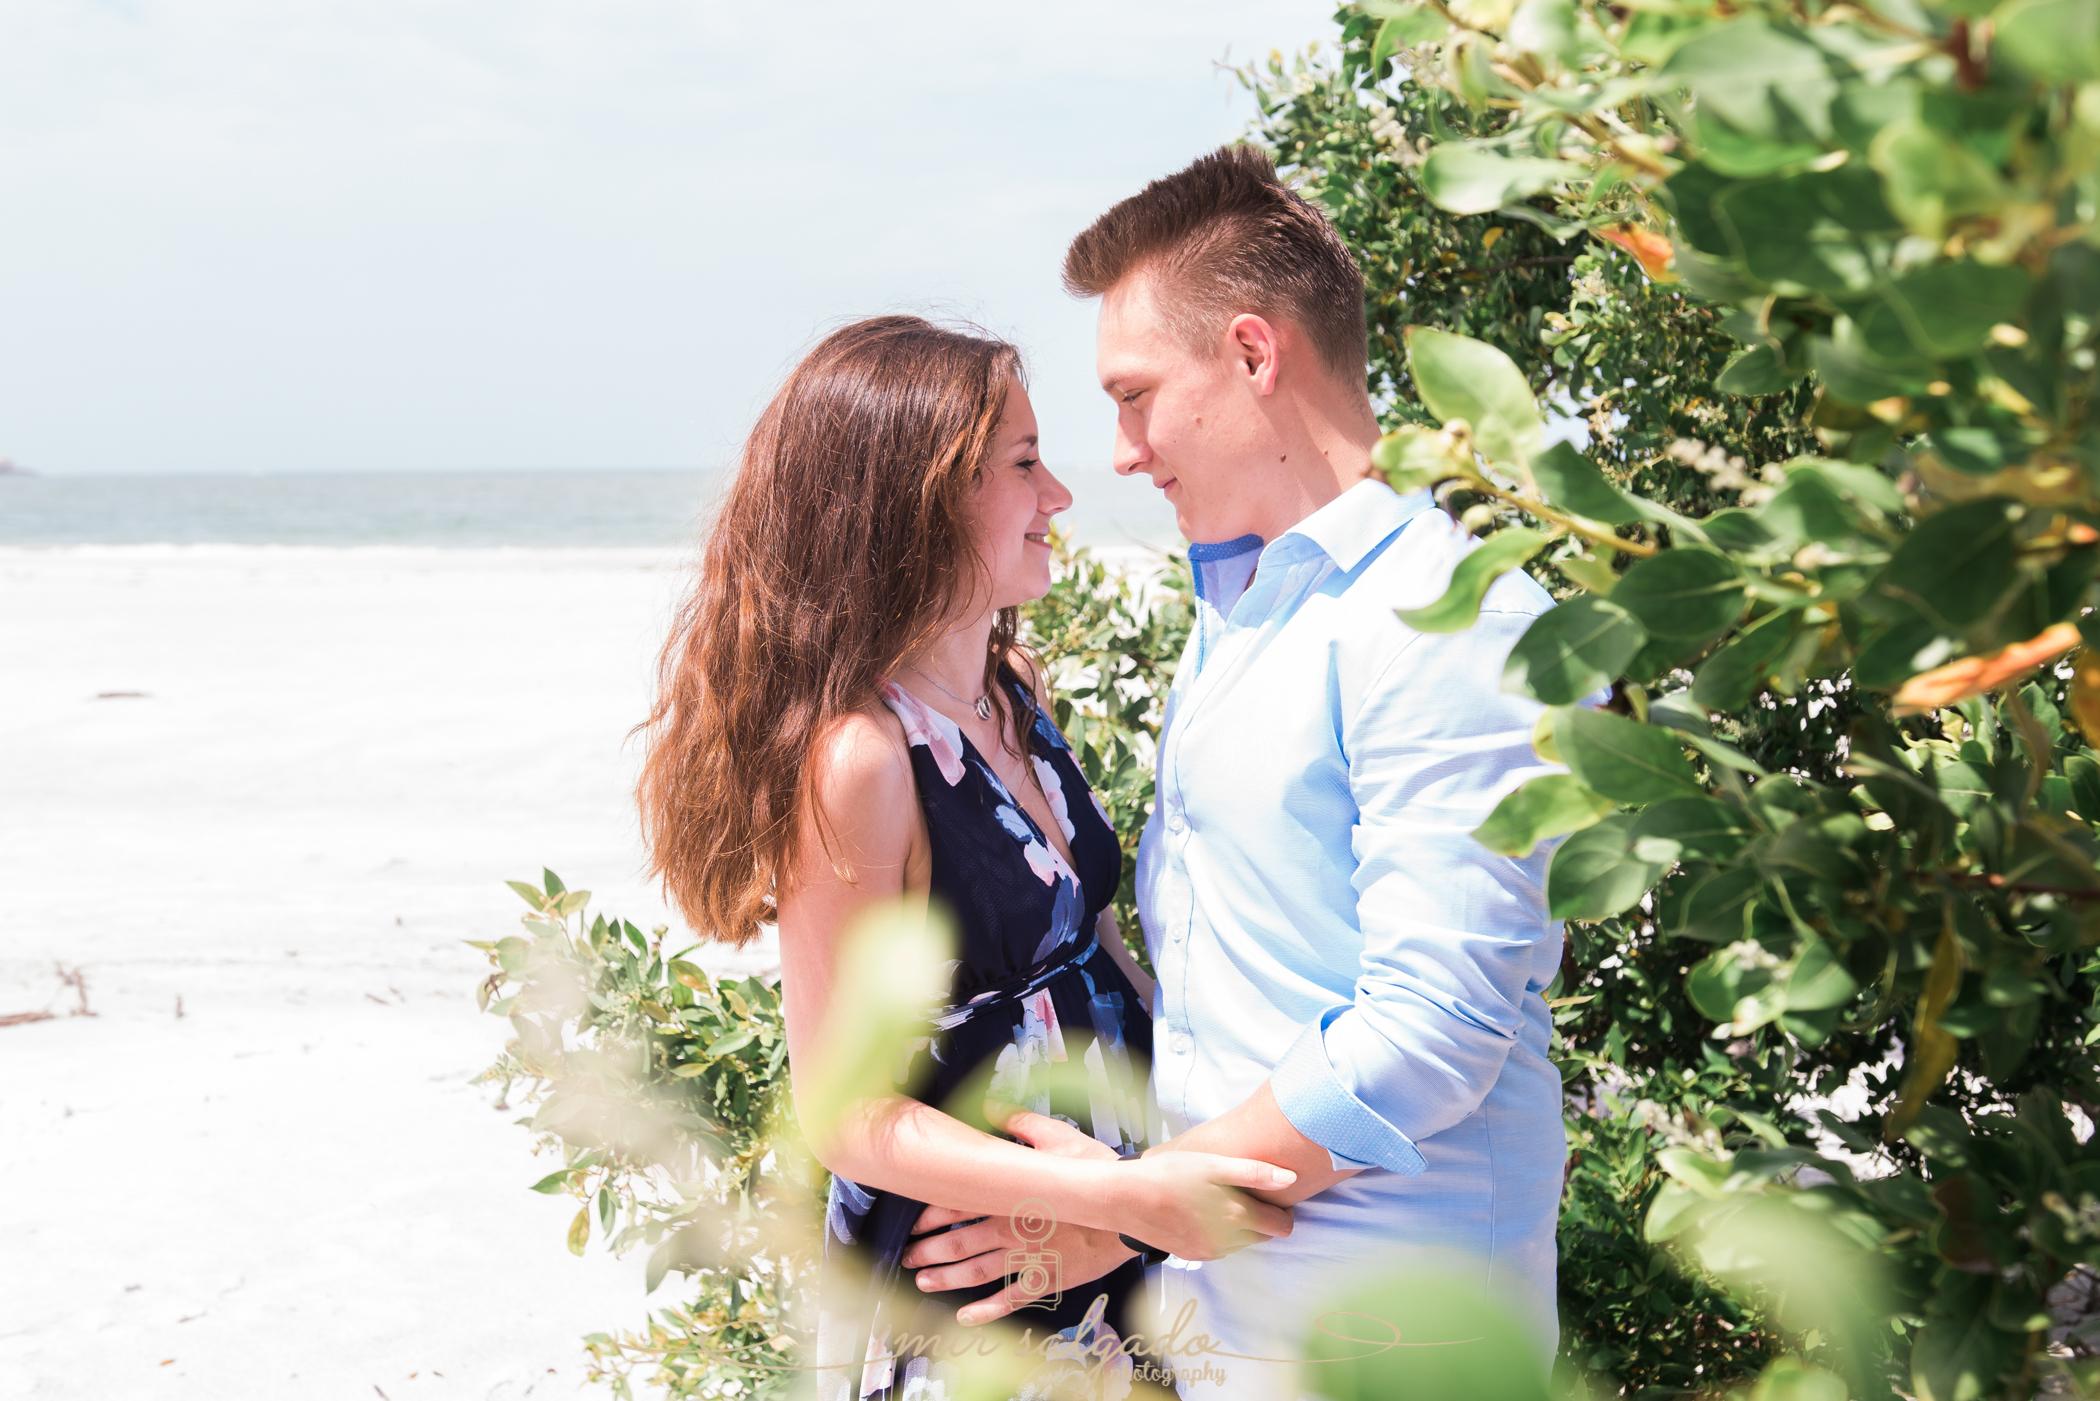 tampa-photographer-couple-session, sarasota-lido-key-beach, couples-portrait-session